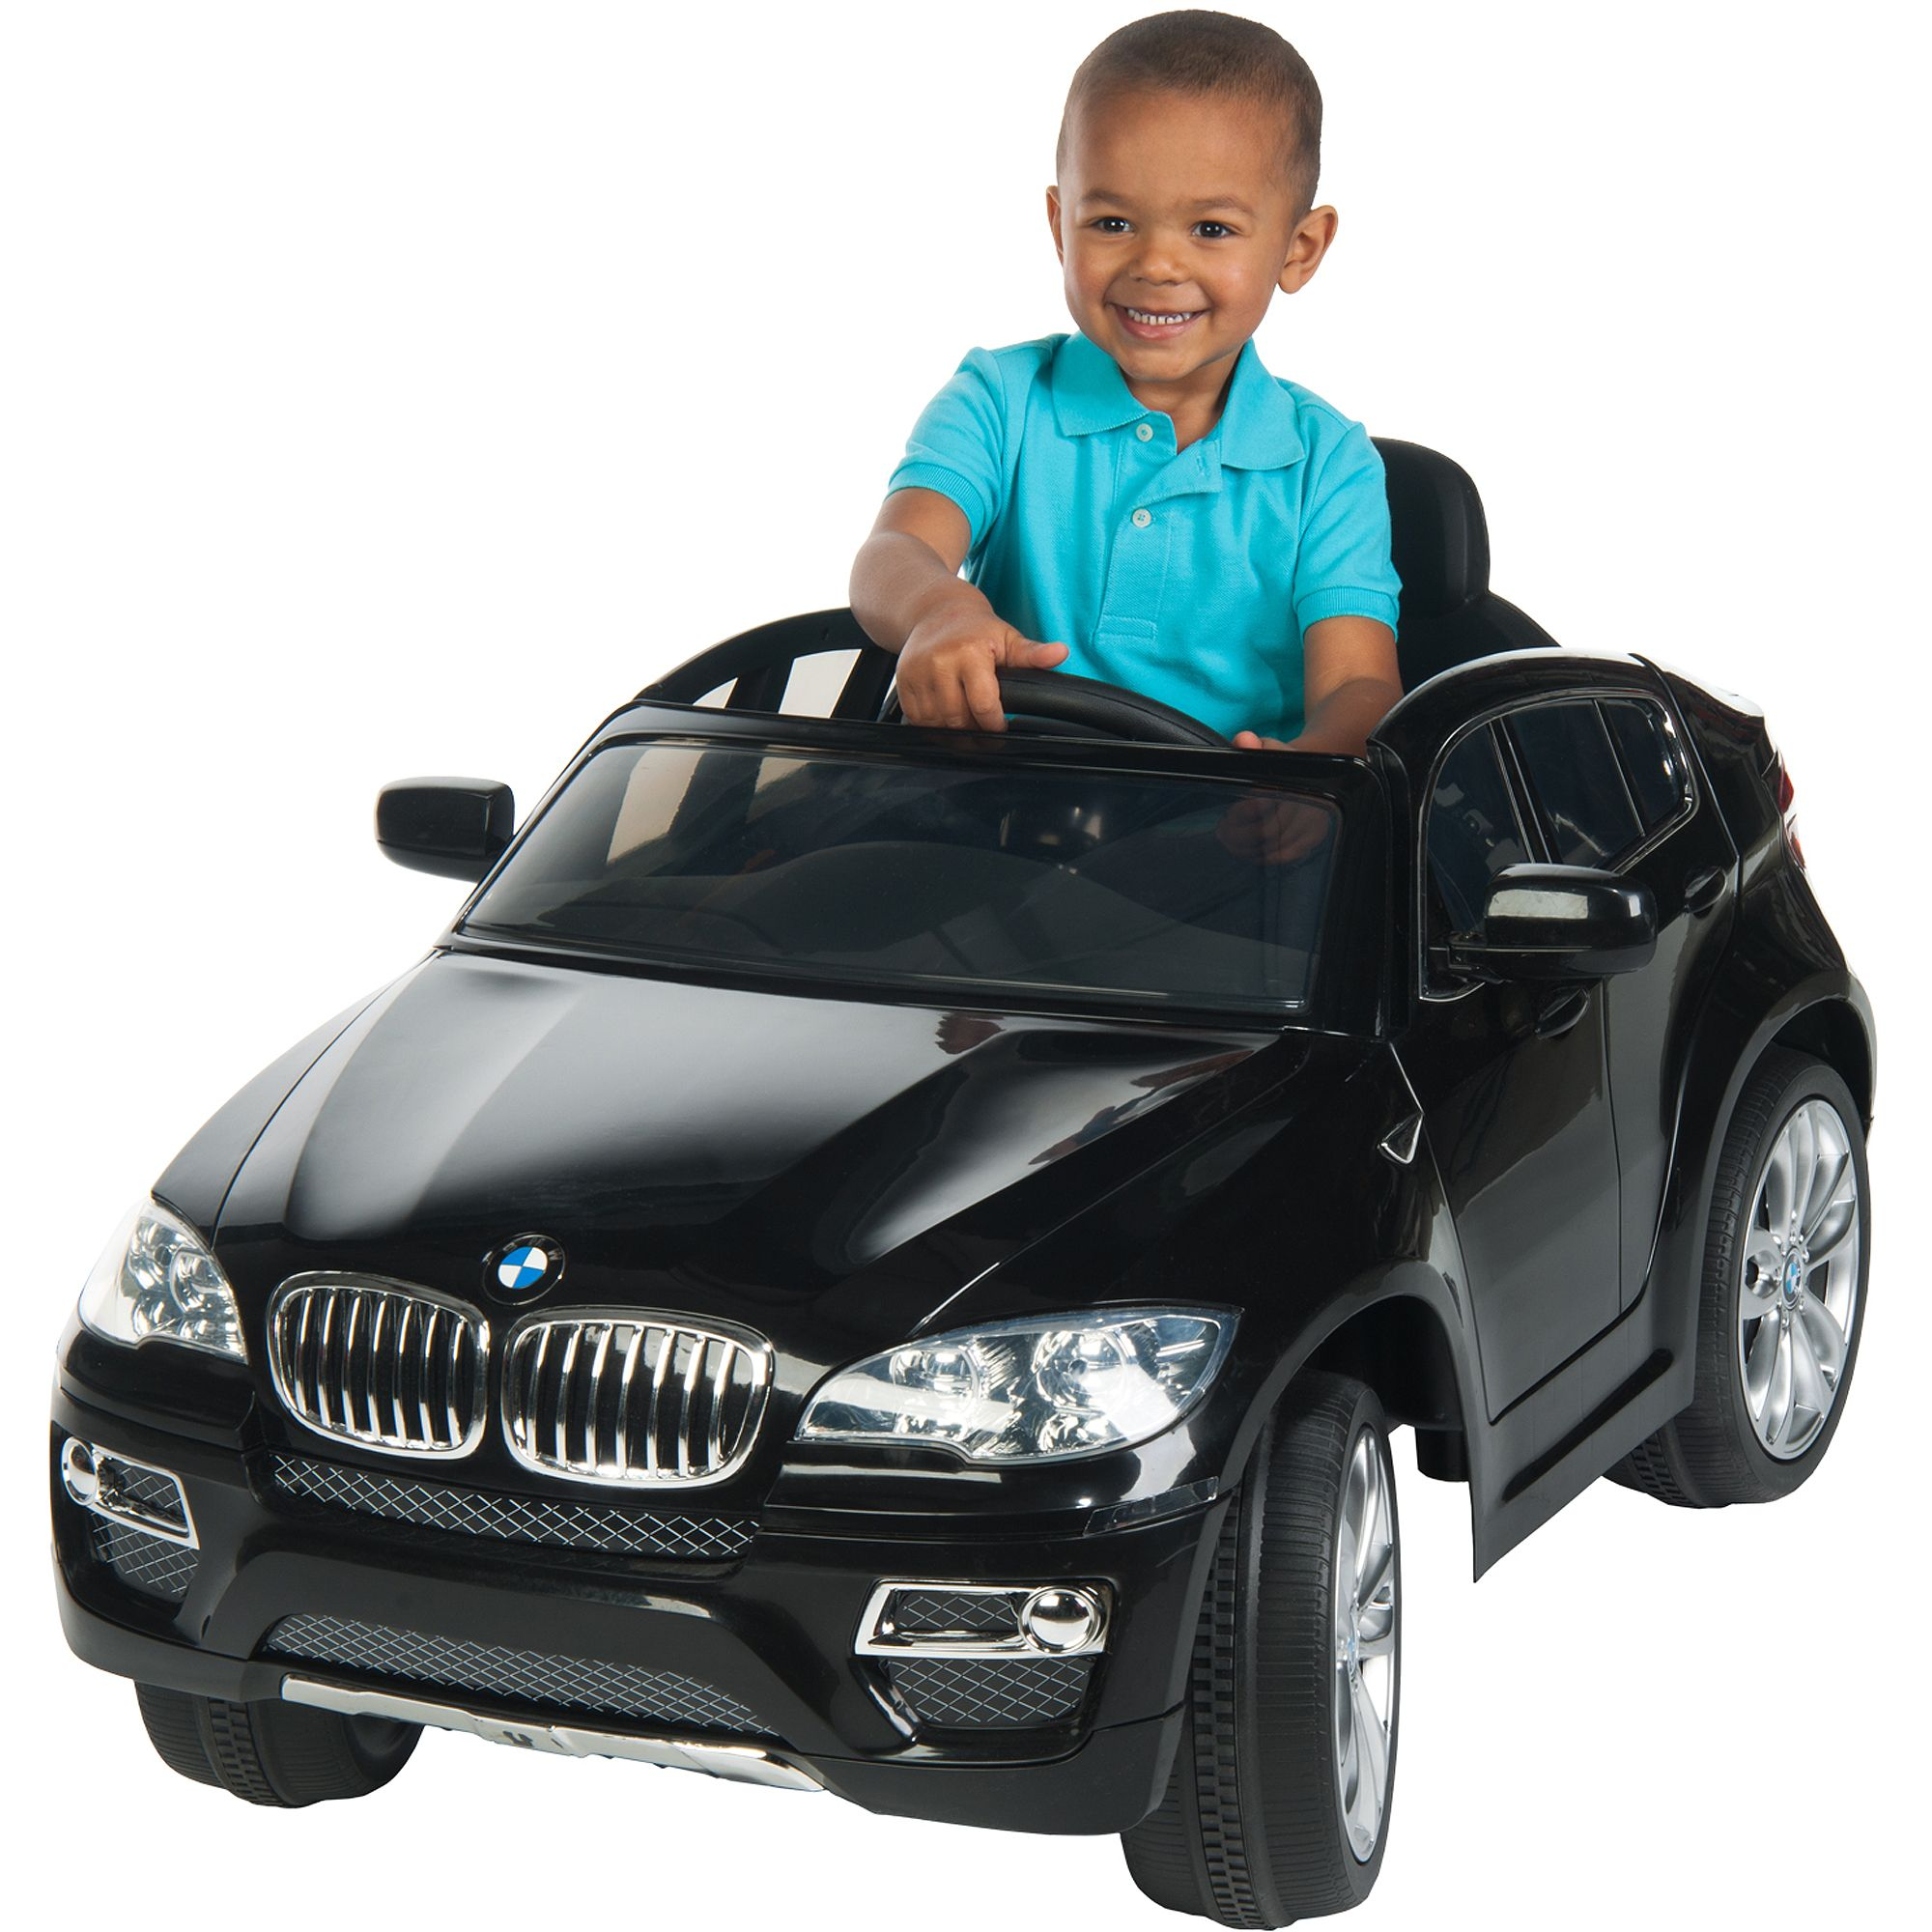 BMW X6 6Volt BatteryPowered RideOn Toy Car by Huffy?